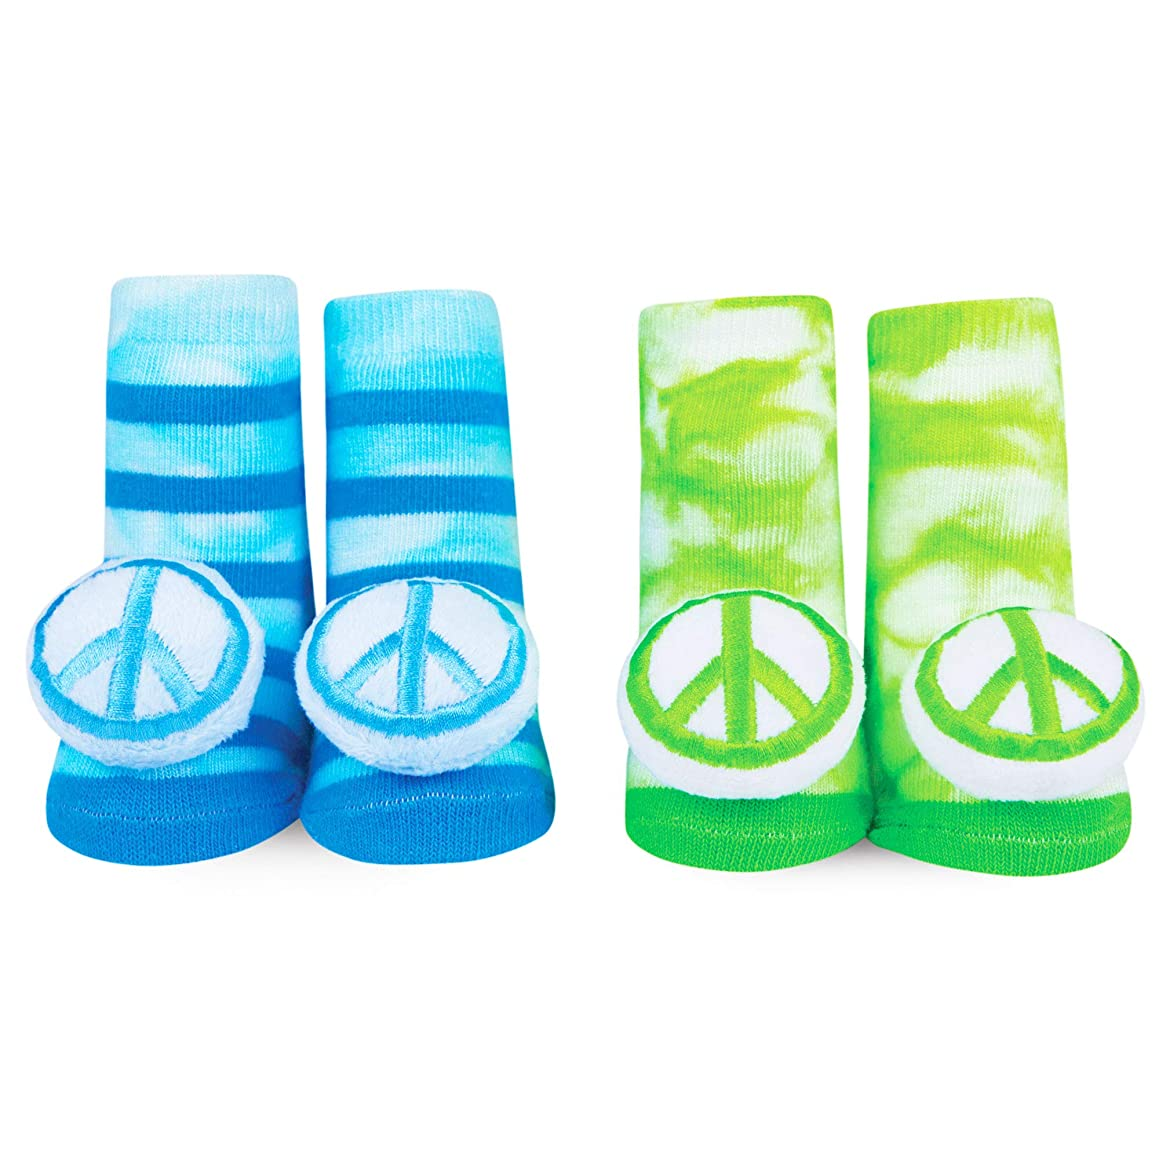 WADDLE Unisex Baby Socks Animal Safari Jungle Zoo Newborn Gift Set Idea 0-12